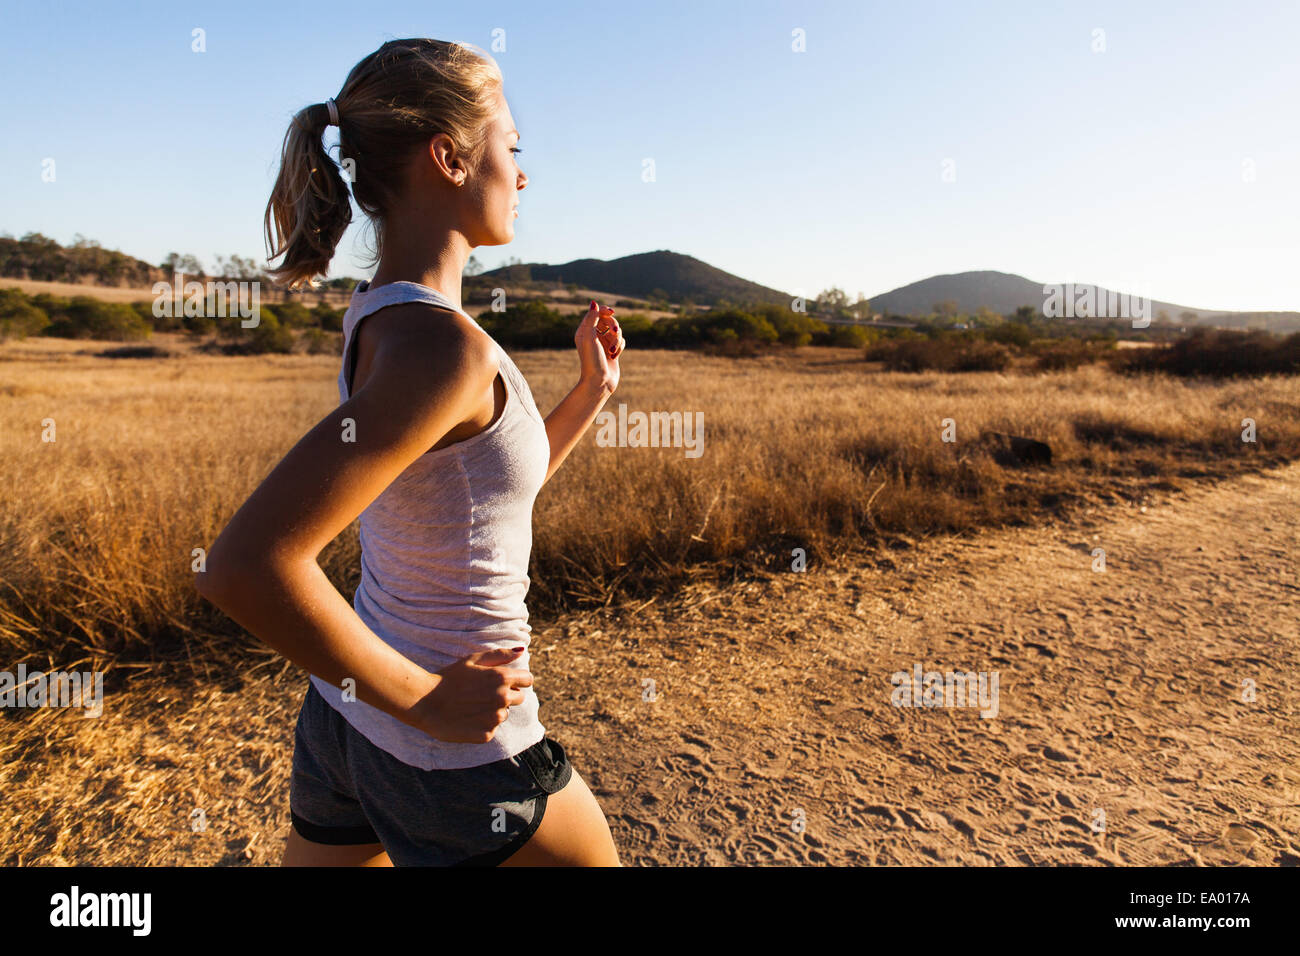 Young woman jogging, Poway, CA, USA - Stock Image